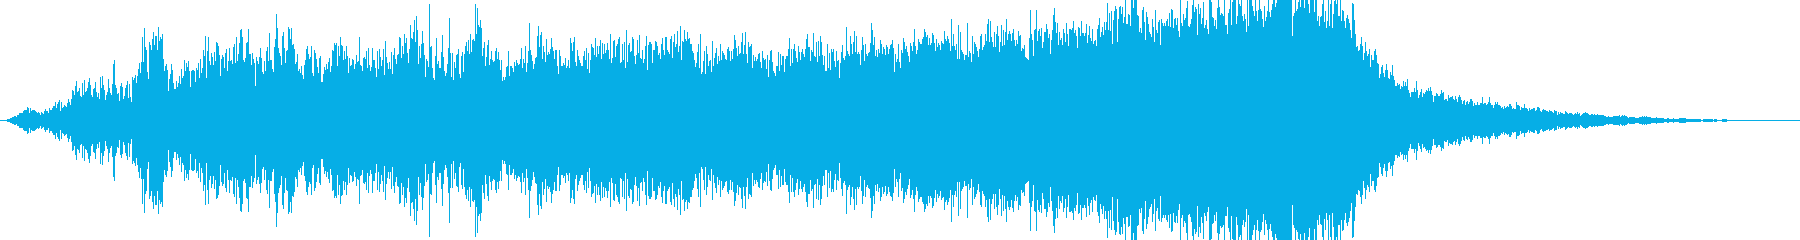 CINEMATIC RISER_41の再生済みの波形